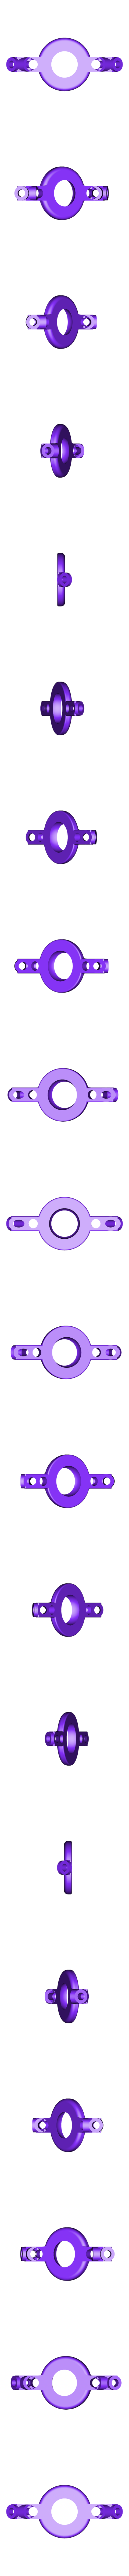 Variadapter.STL Download free STL file Variadapter • Object to 3D print, JeremyRonderberg93